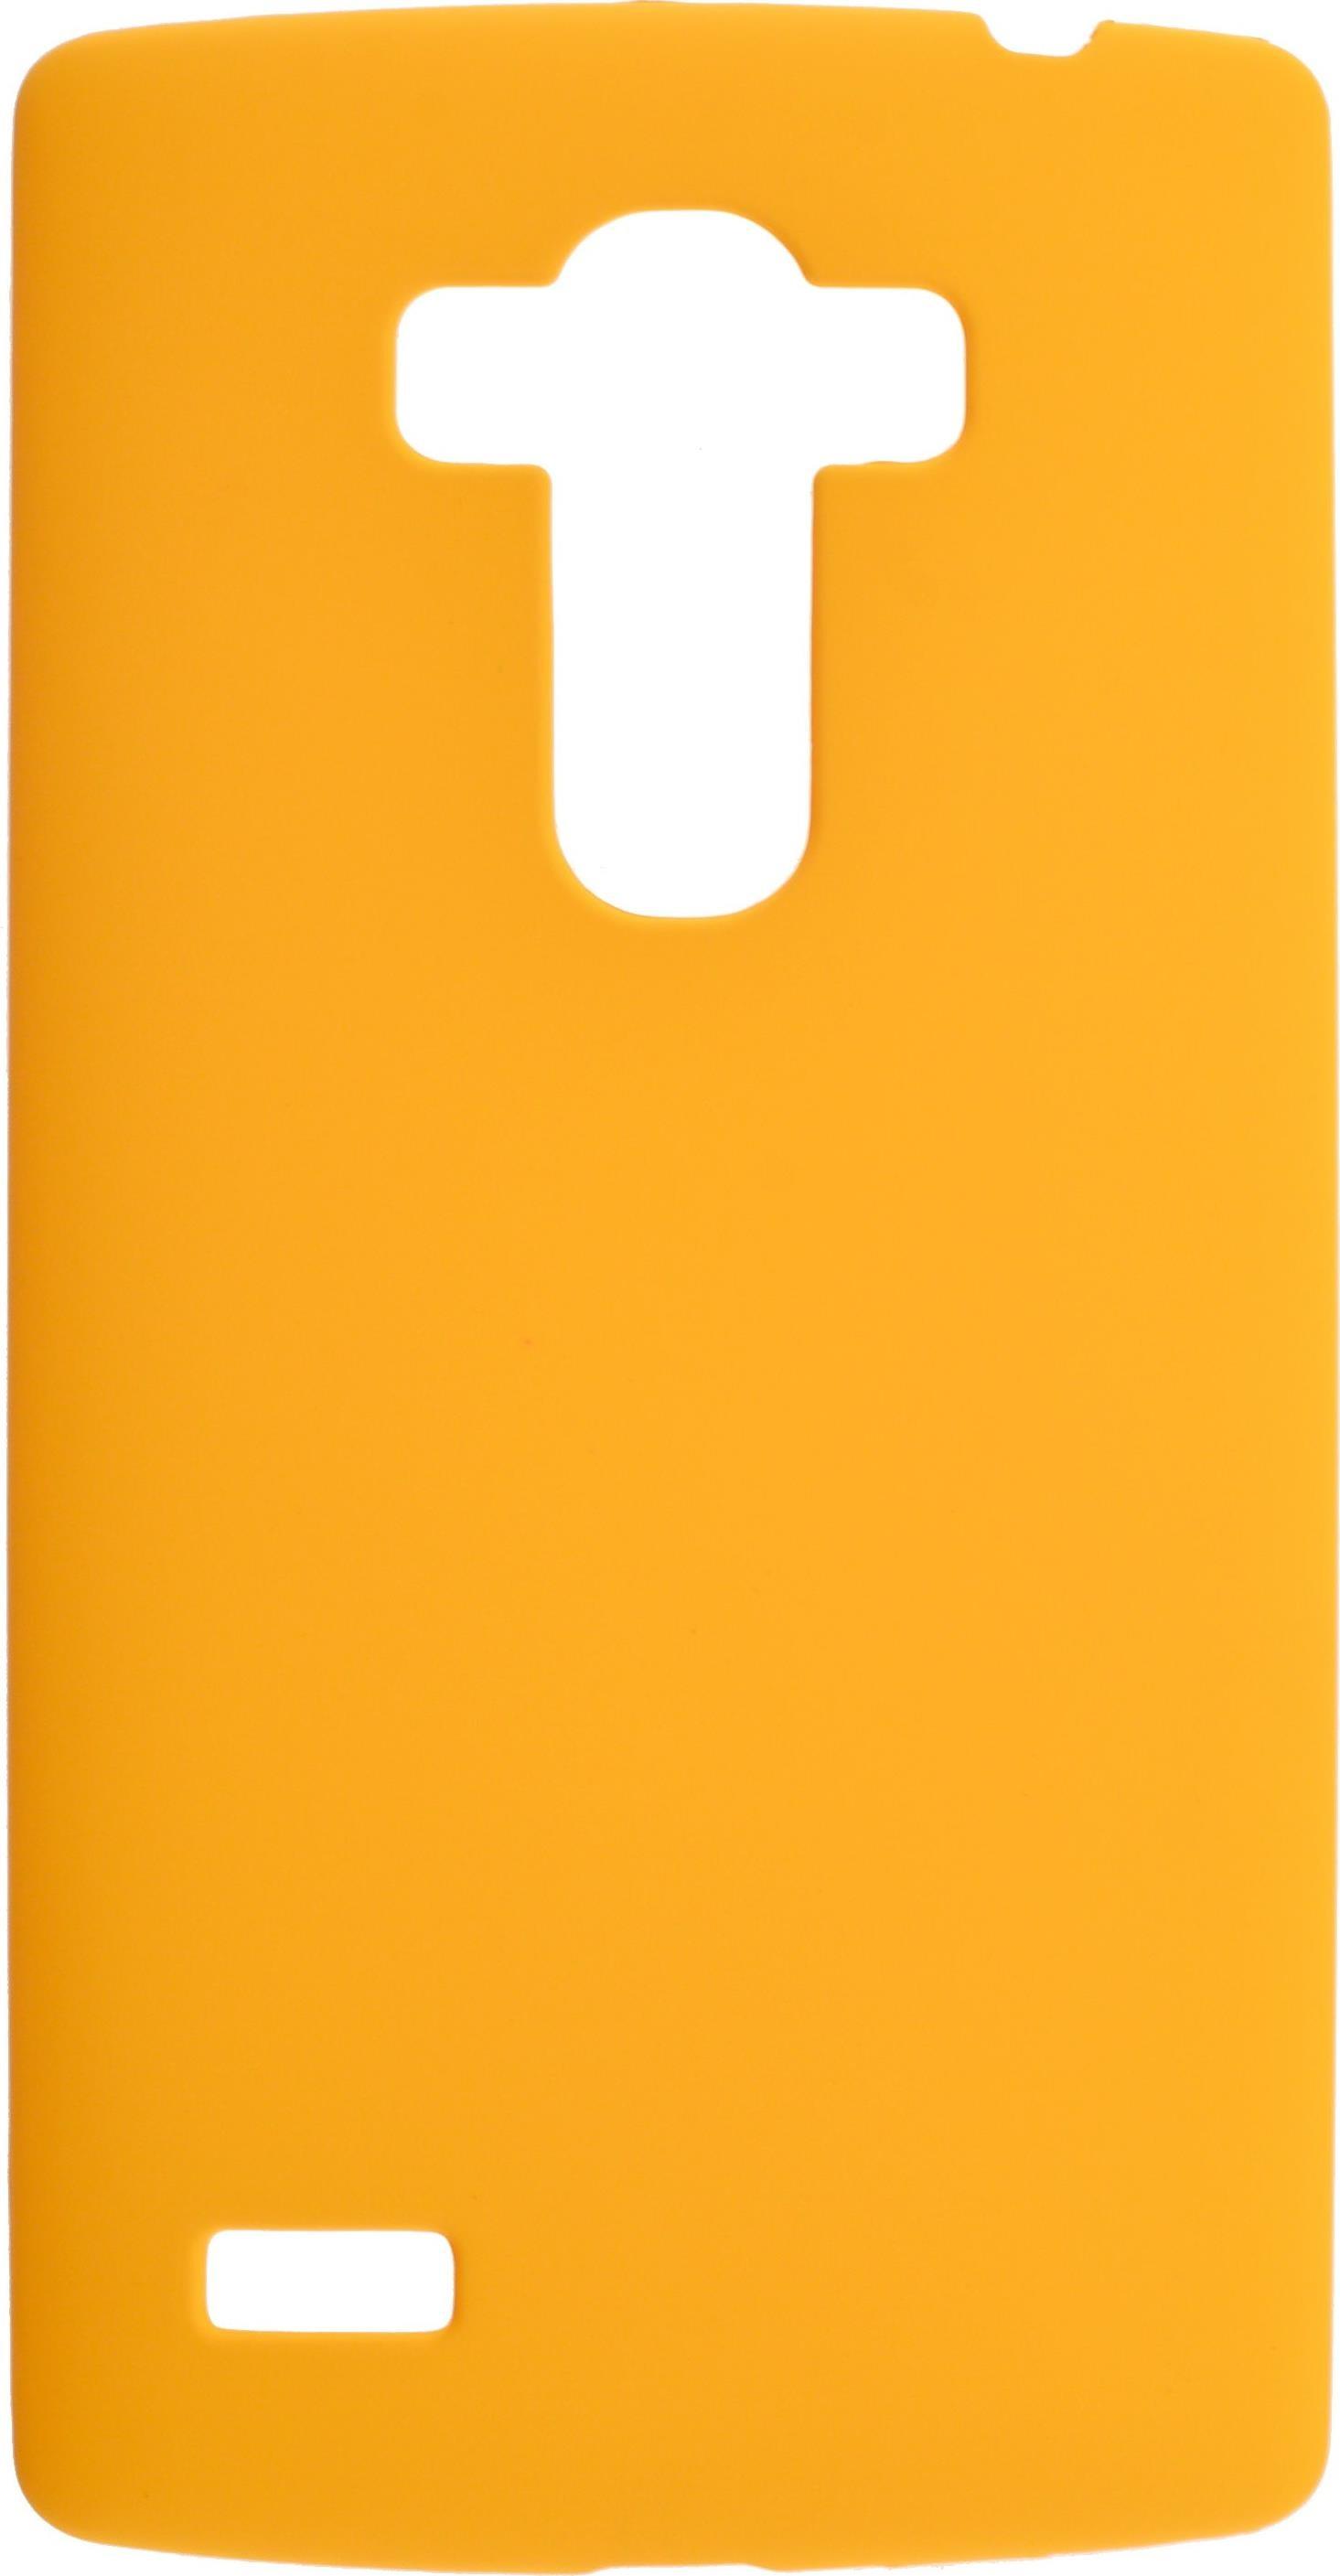 Накладка skinBOX для LG G4S, 2000000079233, желтый накладка skinbox для lg g4s 2000000079226 черный